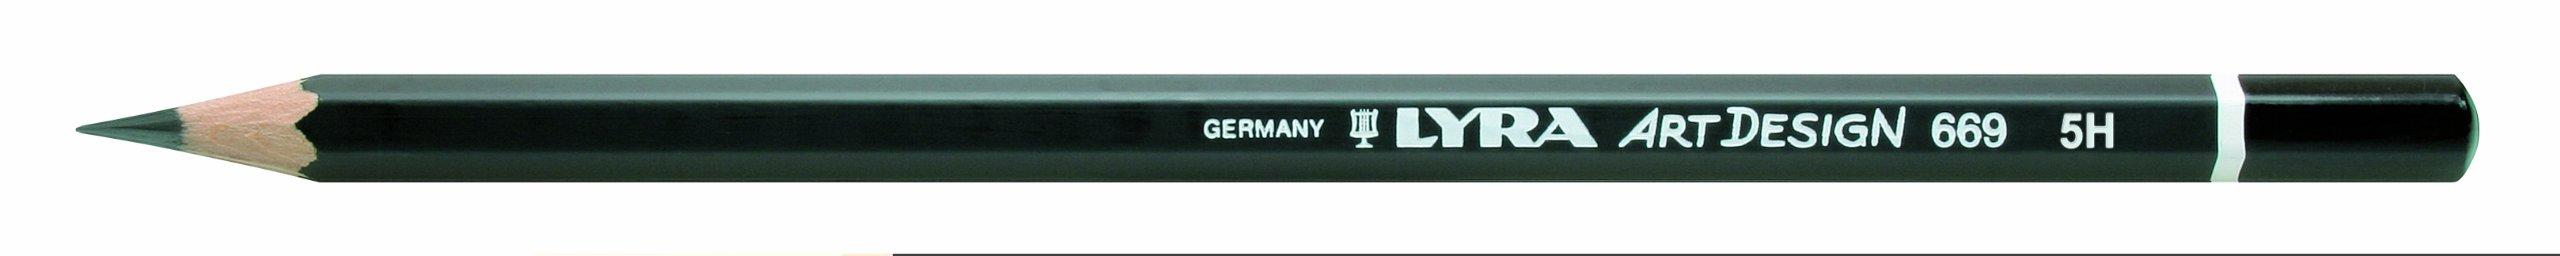 LYRA Rembrandt Art Design Drawing Pencil, 5H Lead, 1 Pencil (1110115)